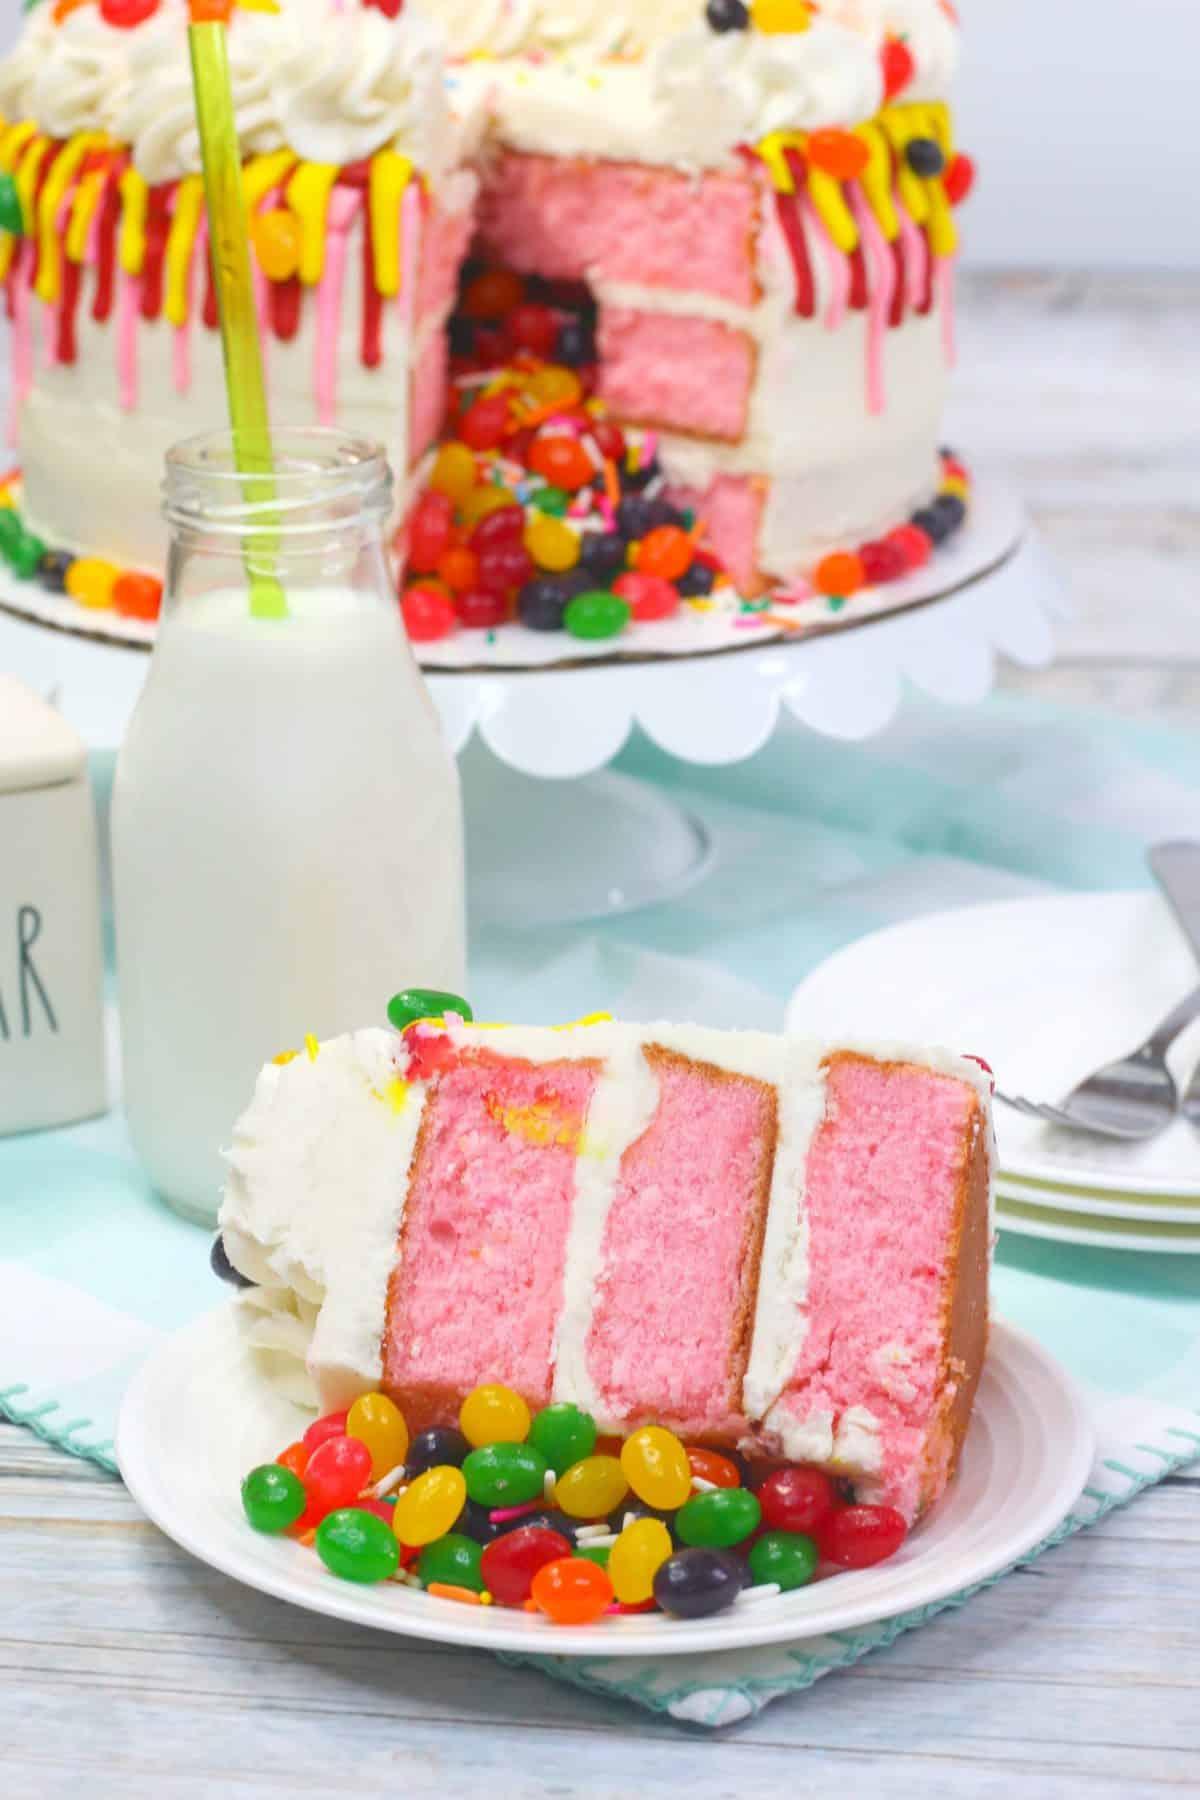 Easter cake recipe, layered jelly bean cake